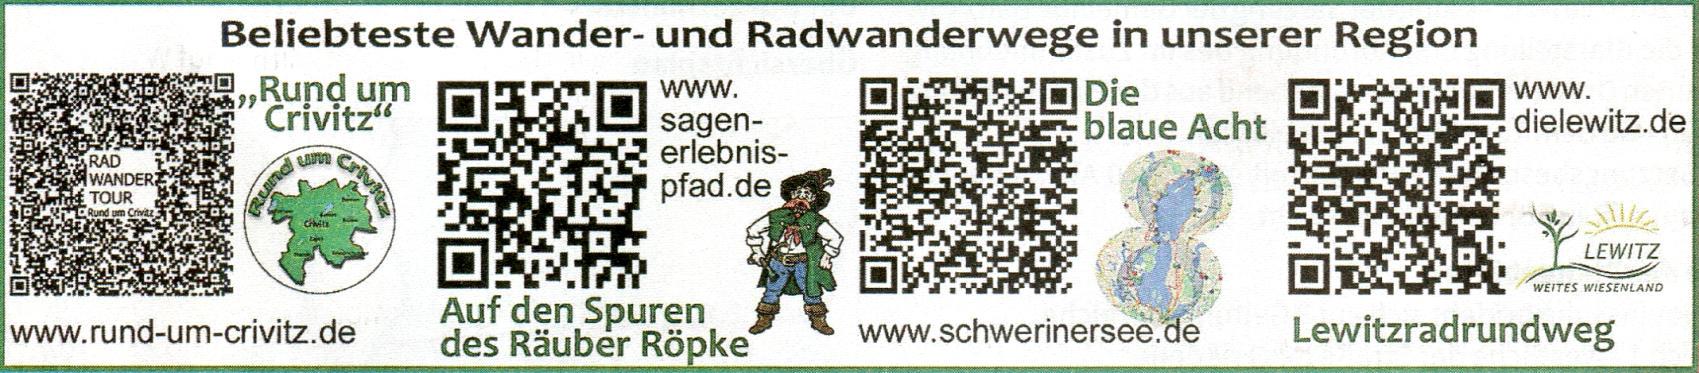 Wanderwege2019